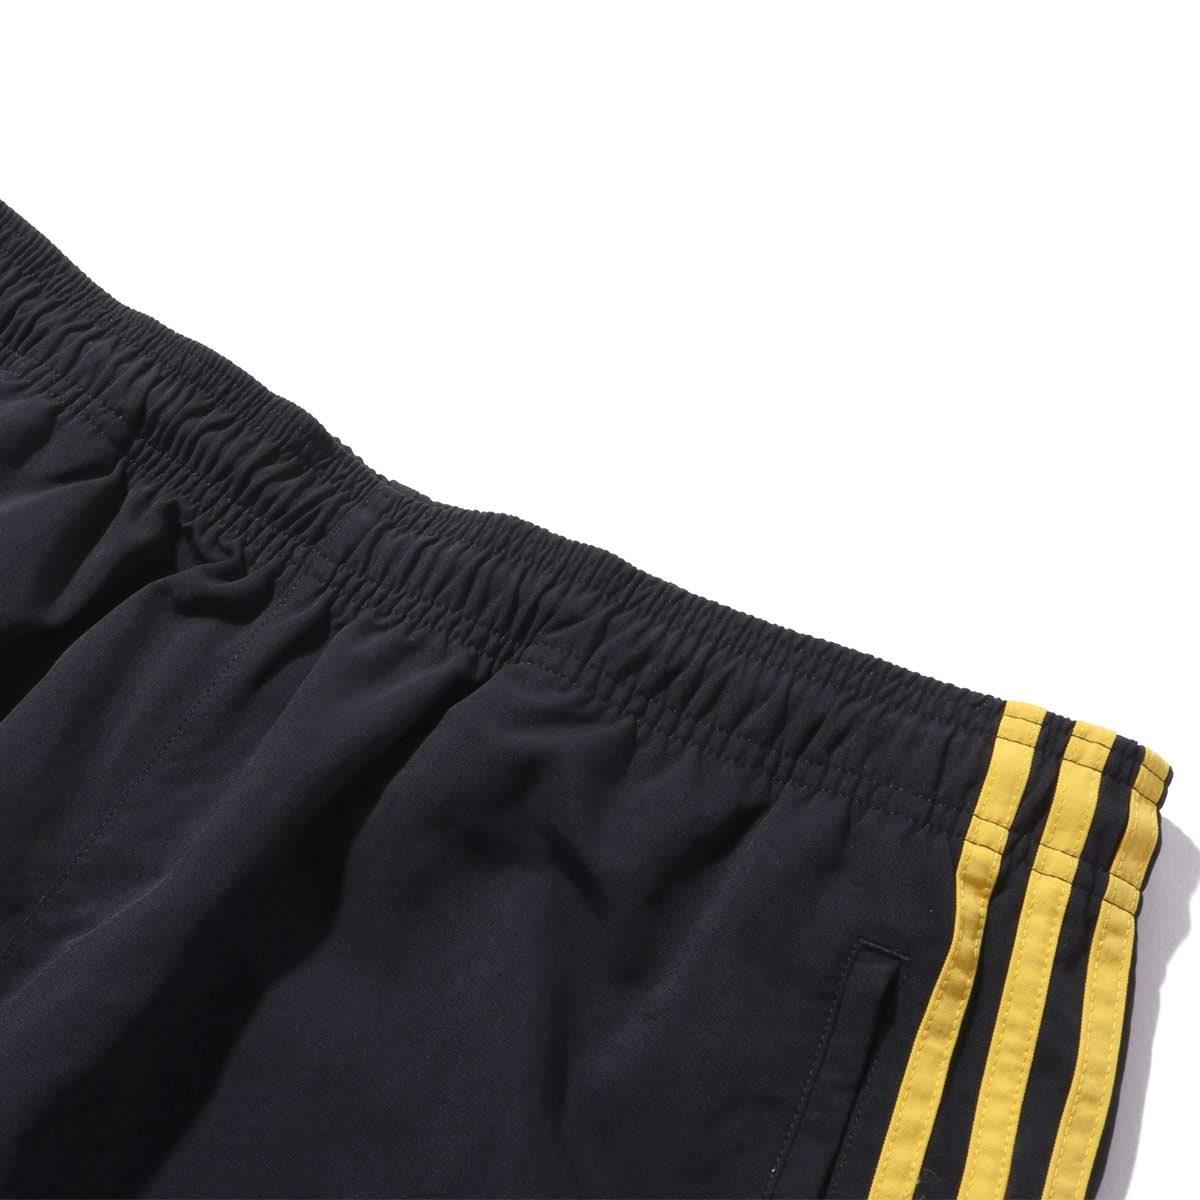 black gold adidas pants